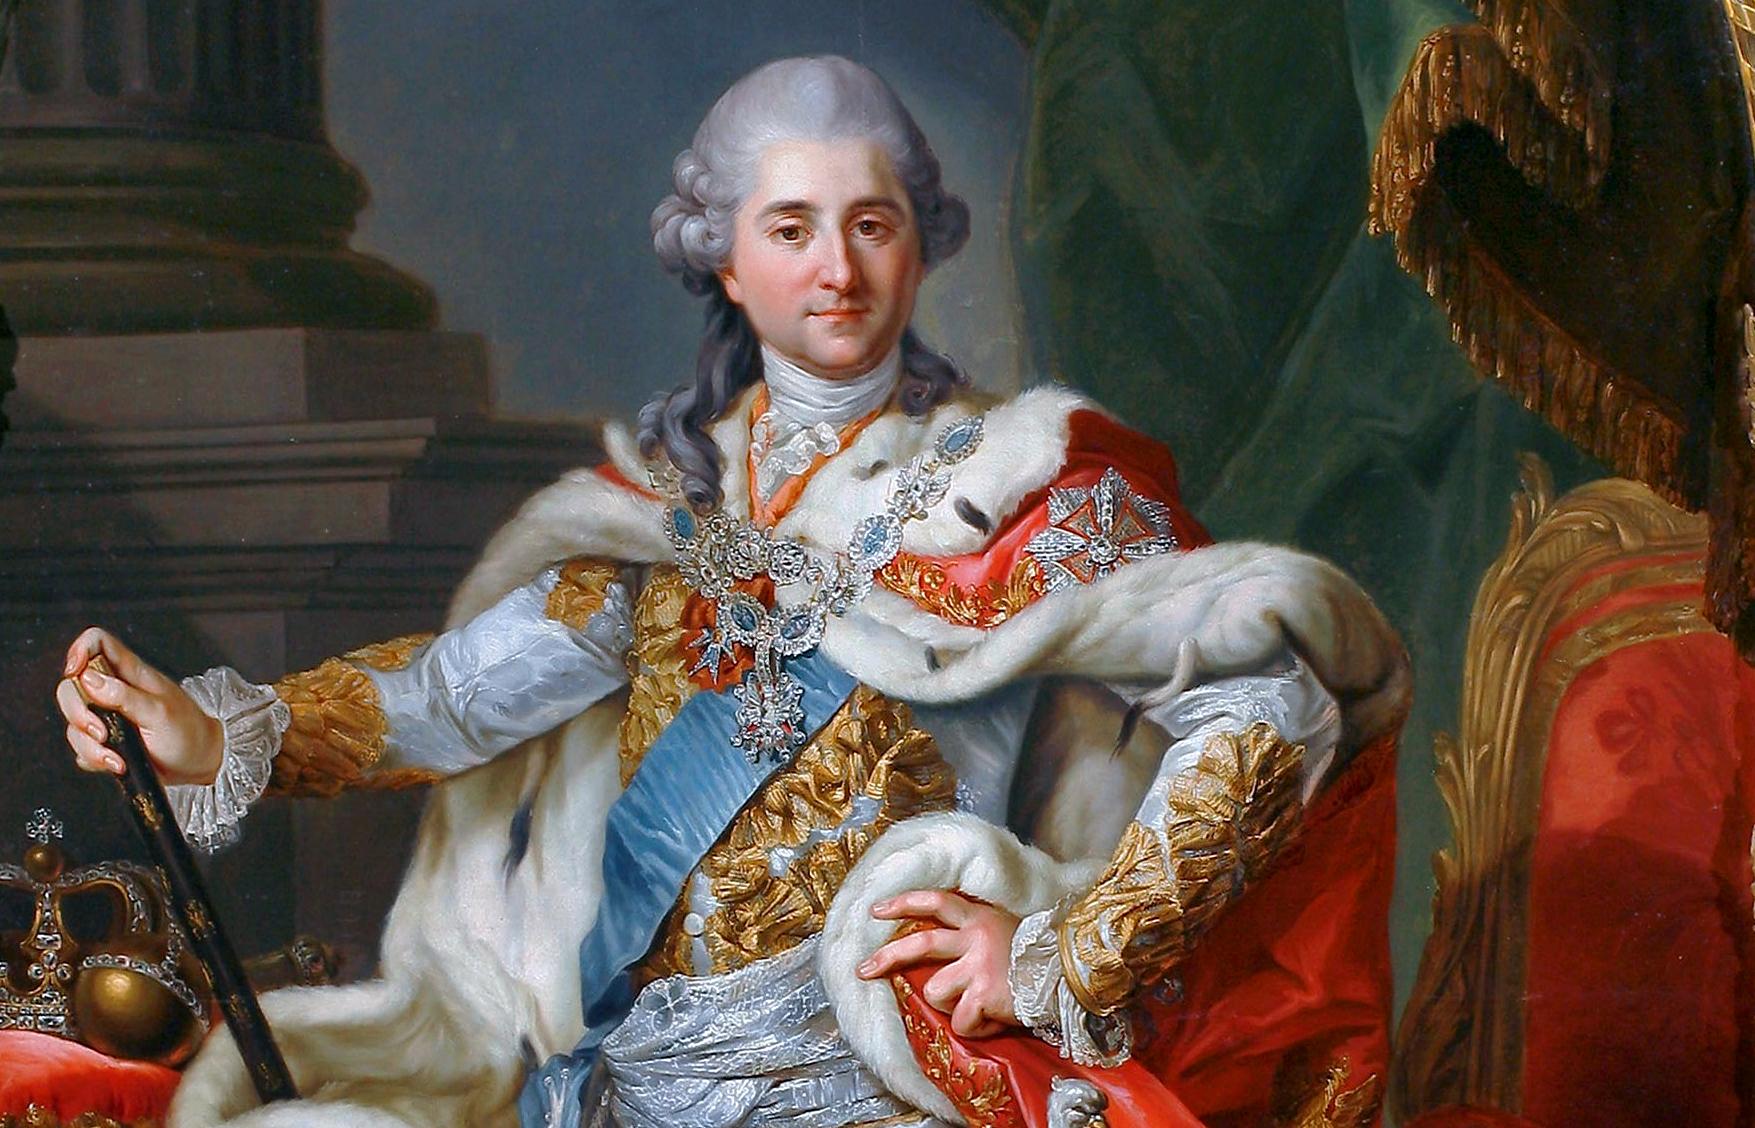 header Stanisław_II_August_Poniatowski_in_coronation_clothes